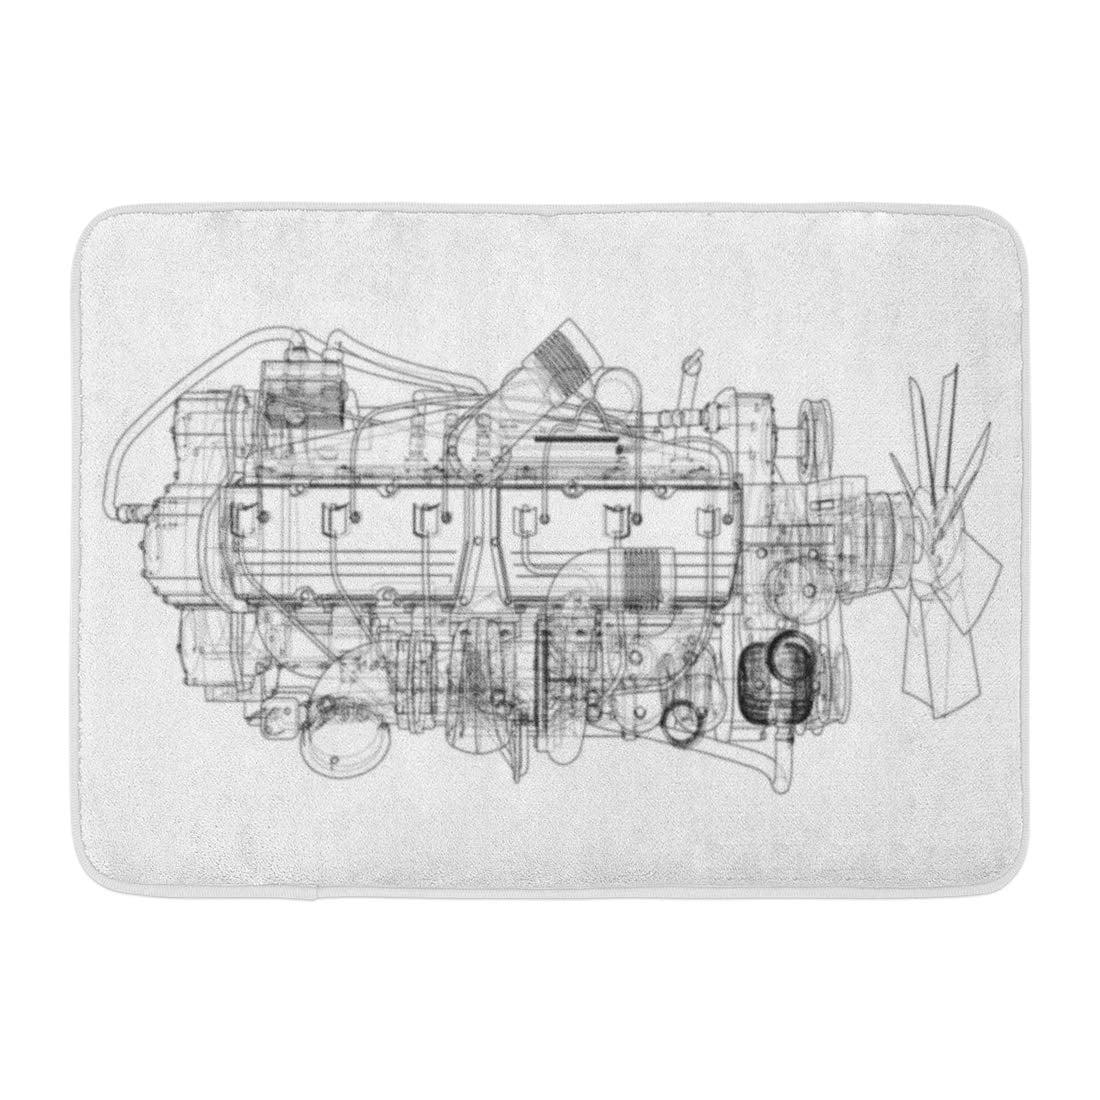 Godpok Blueprint Abstract Car Engine Format Rendering Of 3d Auto Cartoon Rug Doormat Bath Mat 23 6x15 7 Inch Walmart Com Walmart Com